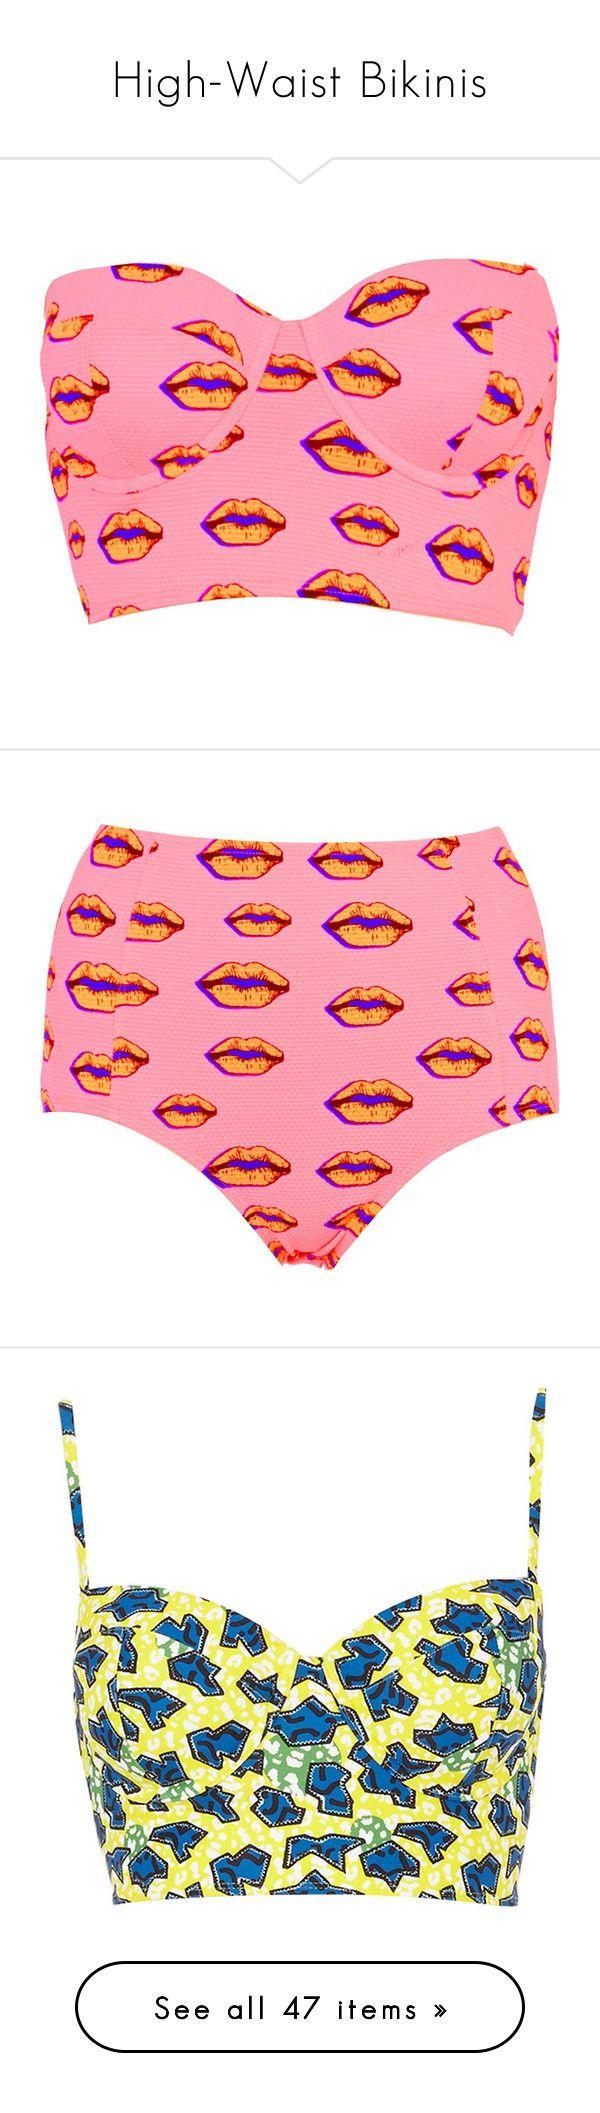 """High-Waist Bikinis"" by mindlessforeva on Polyvore featuring tops, shirts, crop tops, swimwear, sale, river island, bikinis, bikini bottoms, swimsuits and bathing suits"